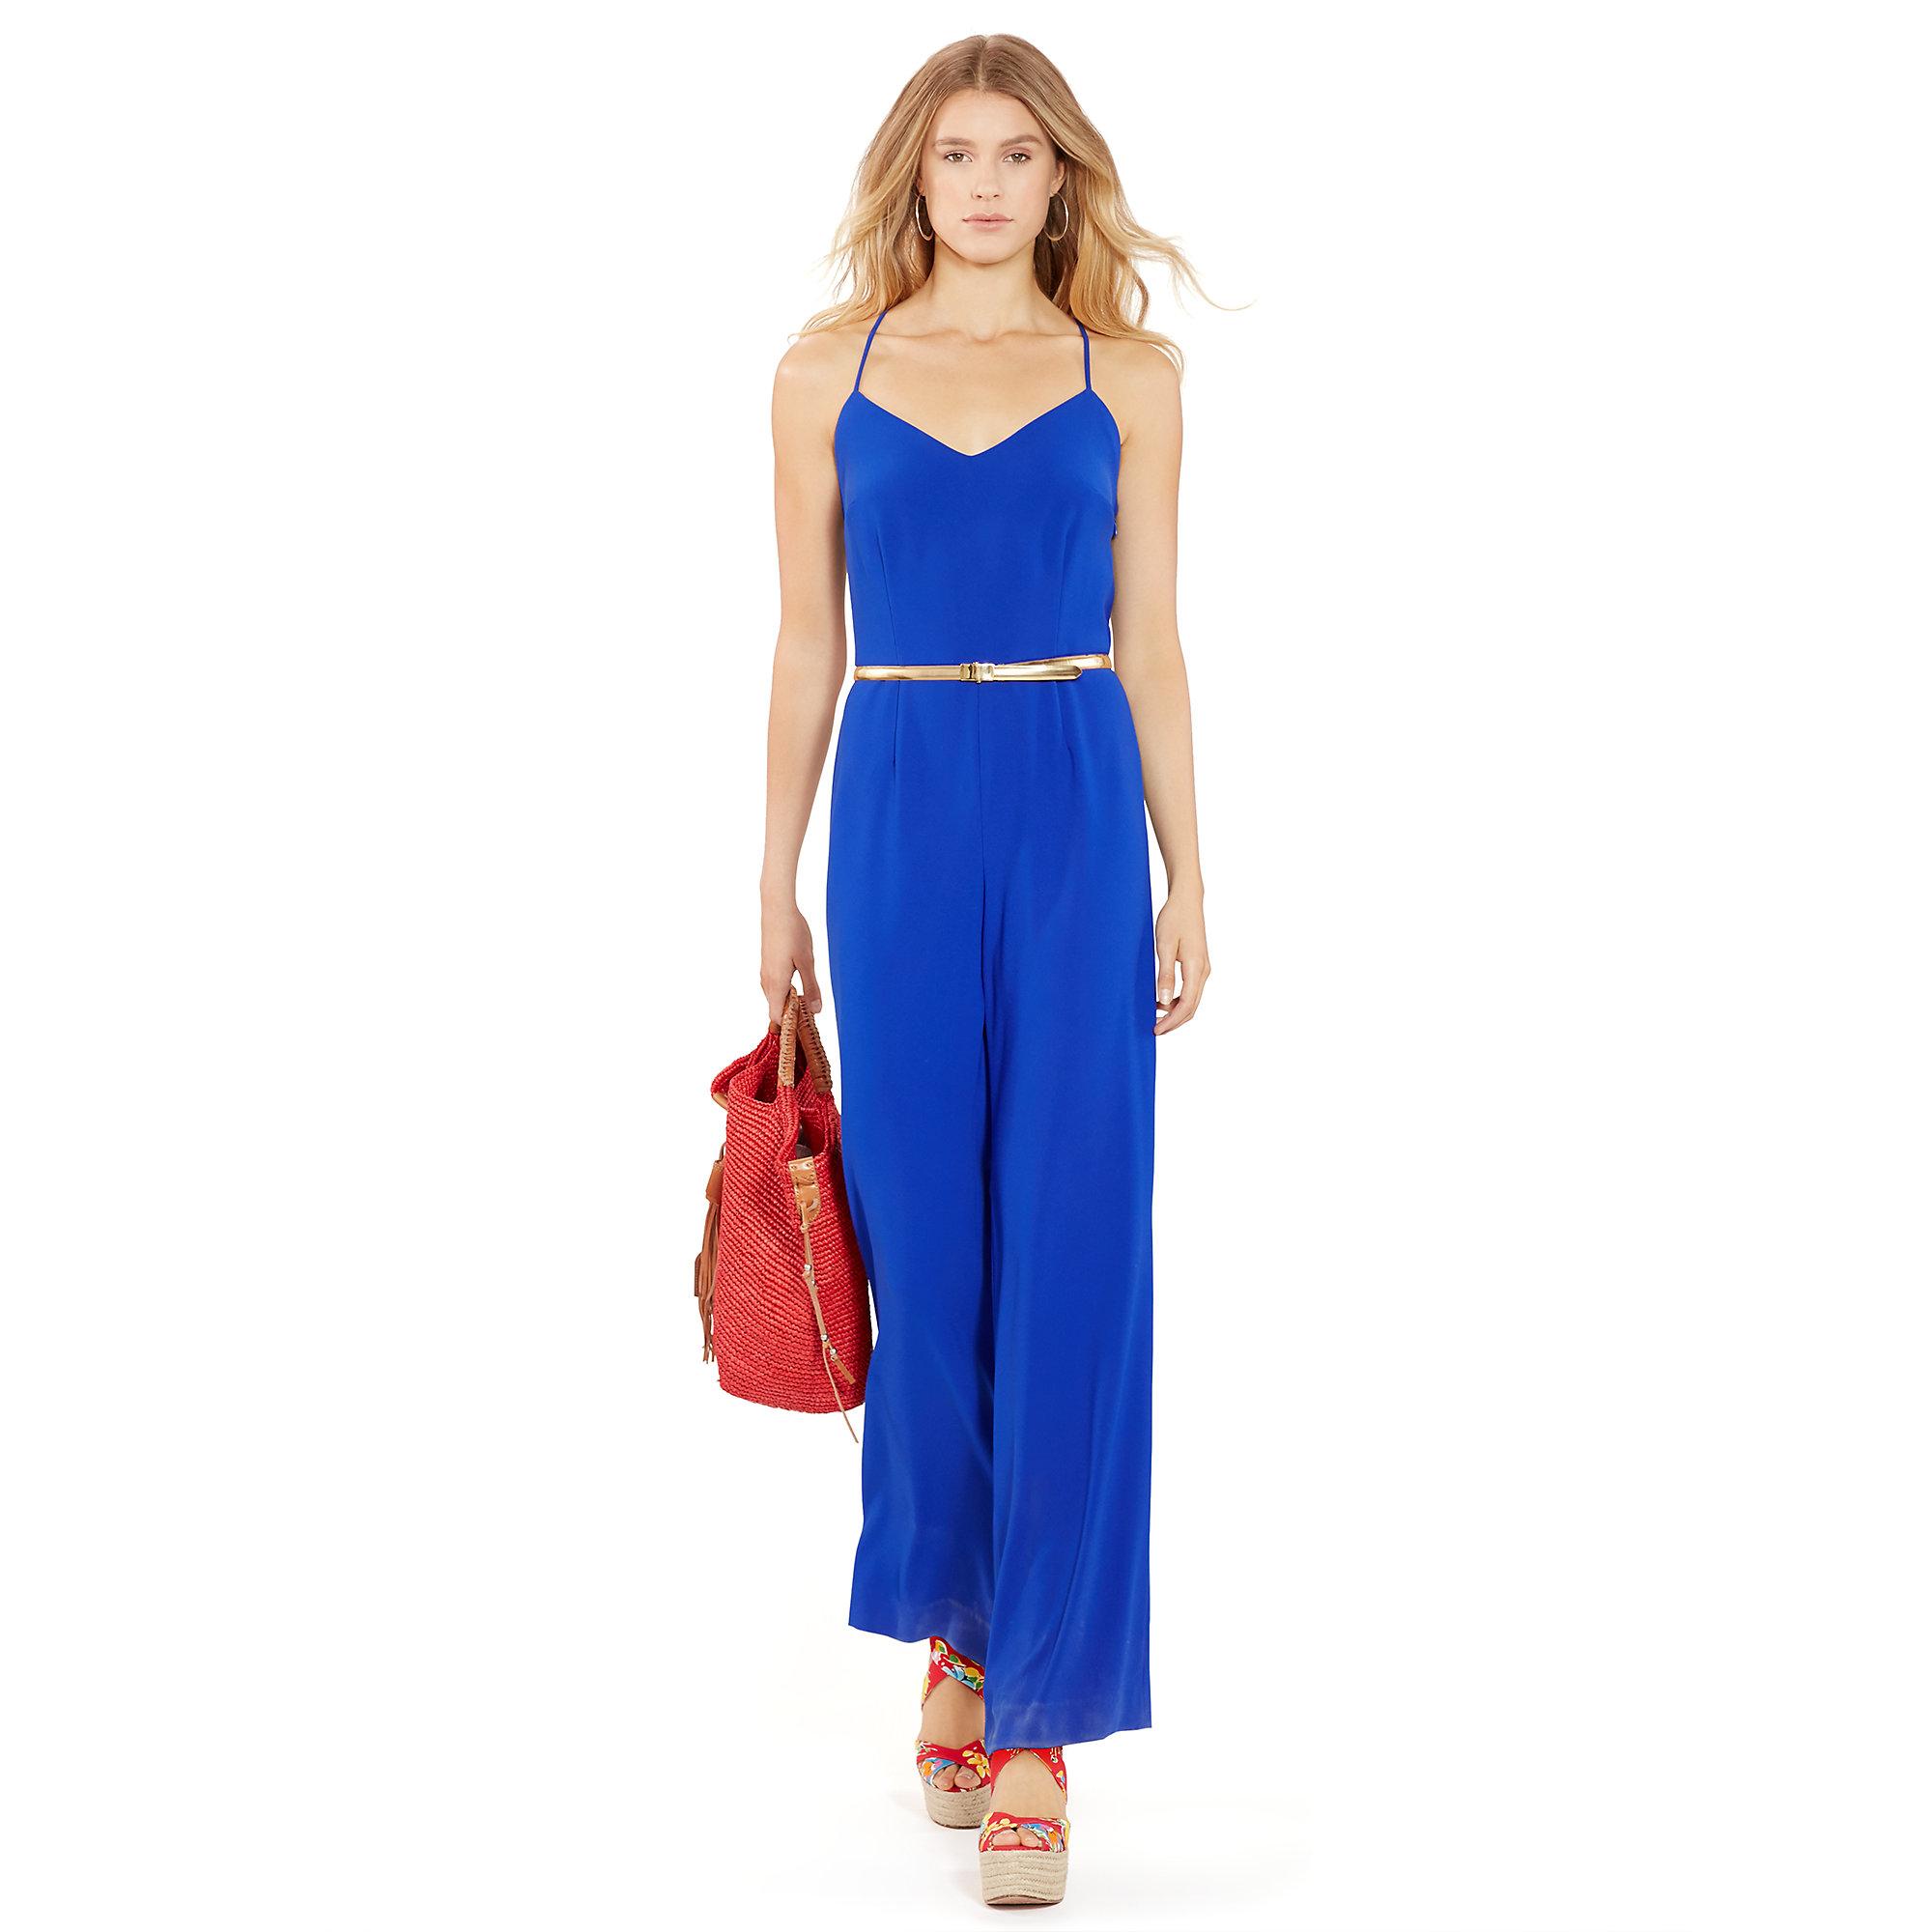 a8df1b8def3 Lyst - Polo Ralph Lauren Crepe Wide-leg Jumpsuit in Blue